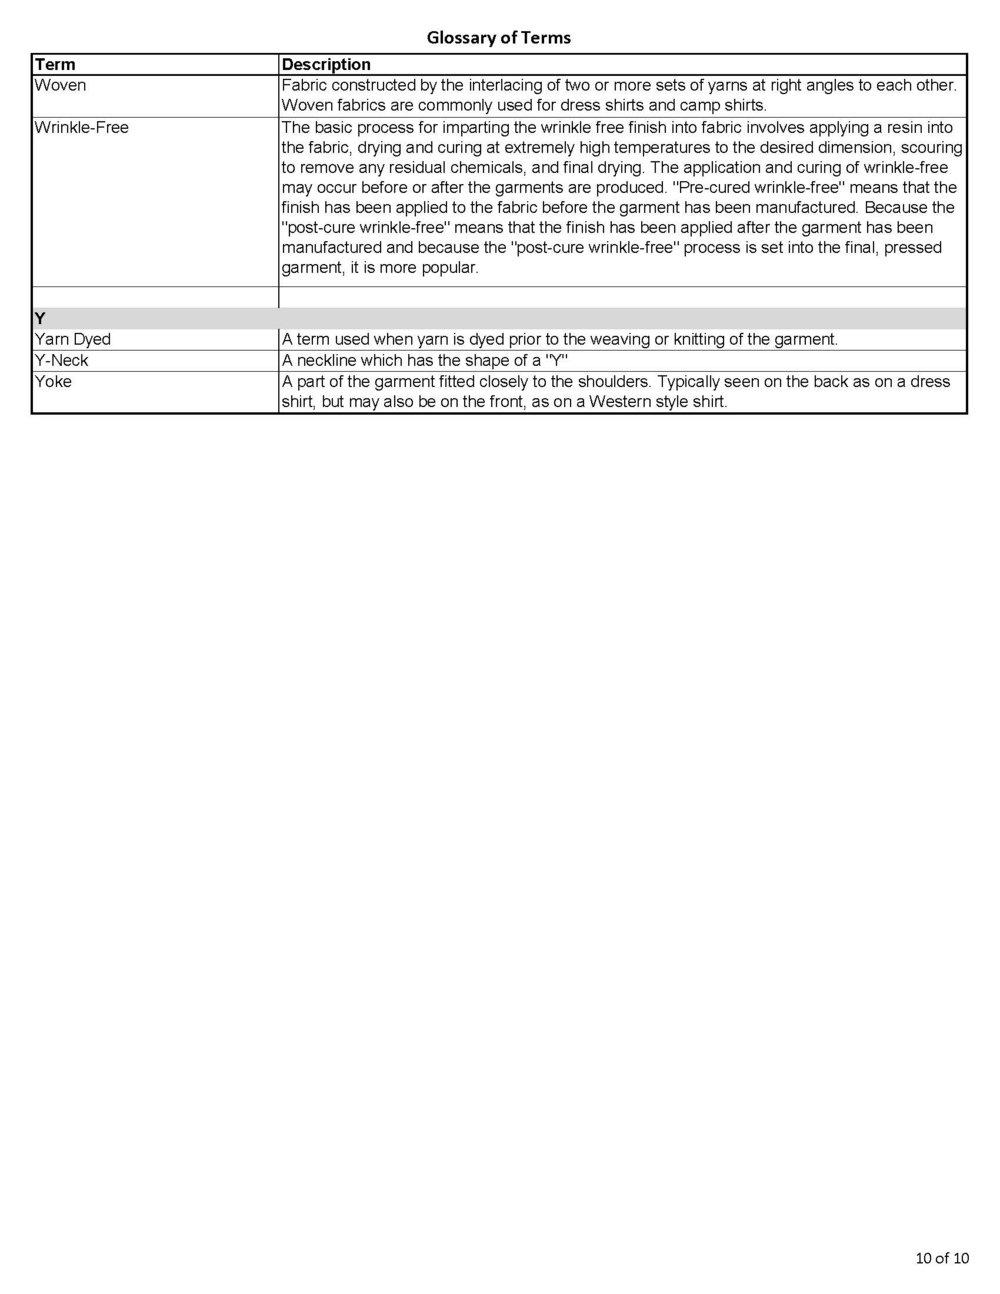 apparelGlossary_Page_10.jpg